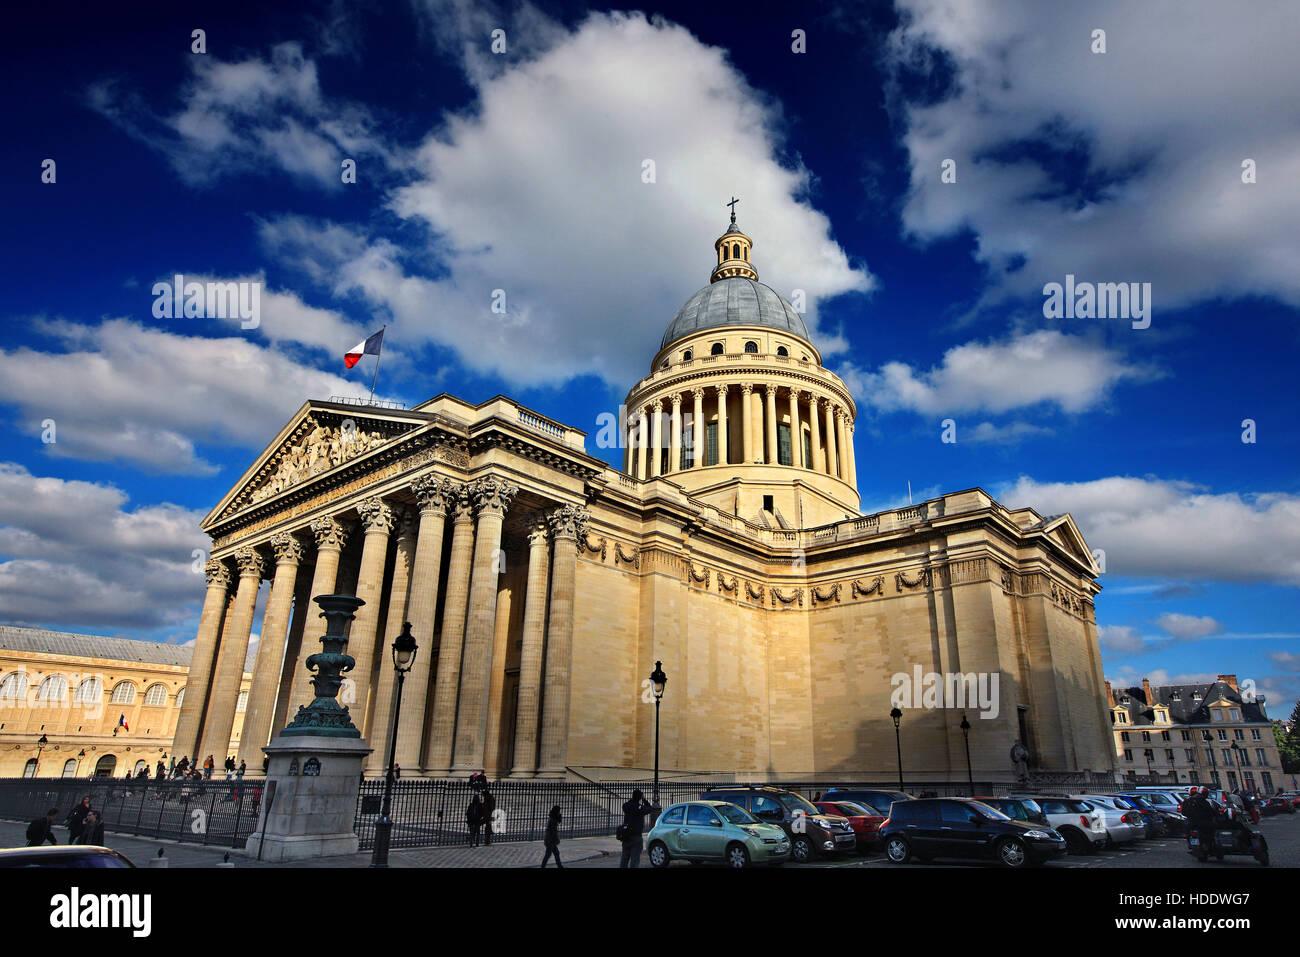 Das Pantheon, Quartier Latin, Paris, Frankreich. Stockbild